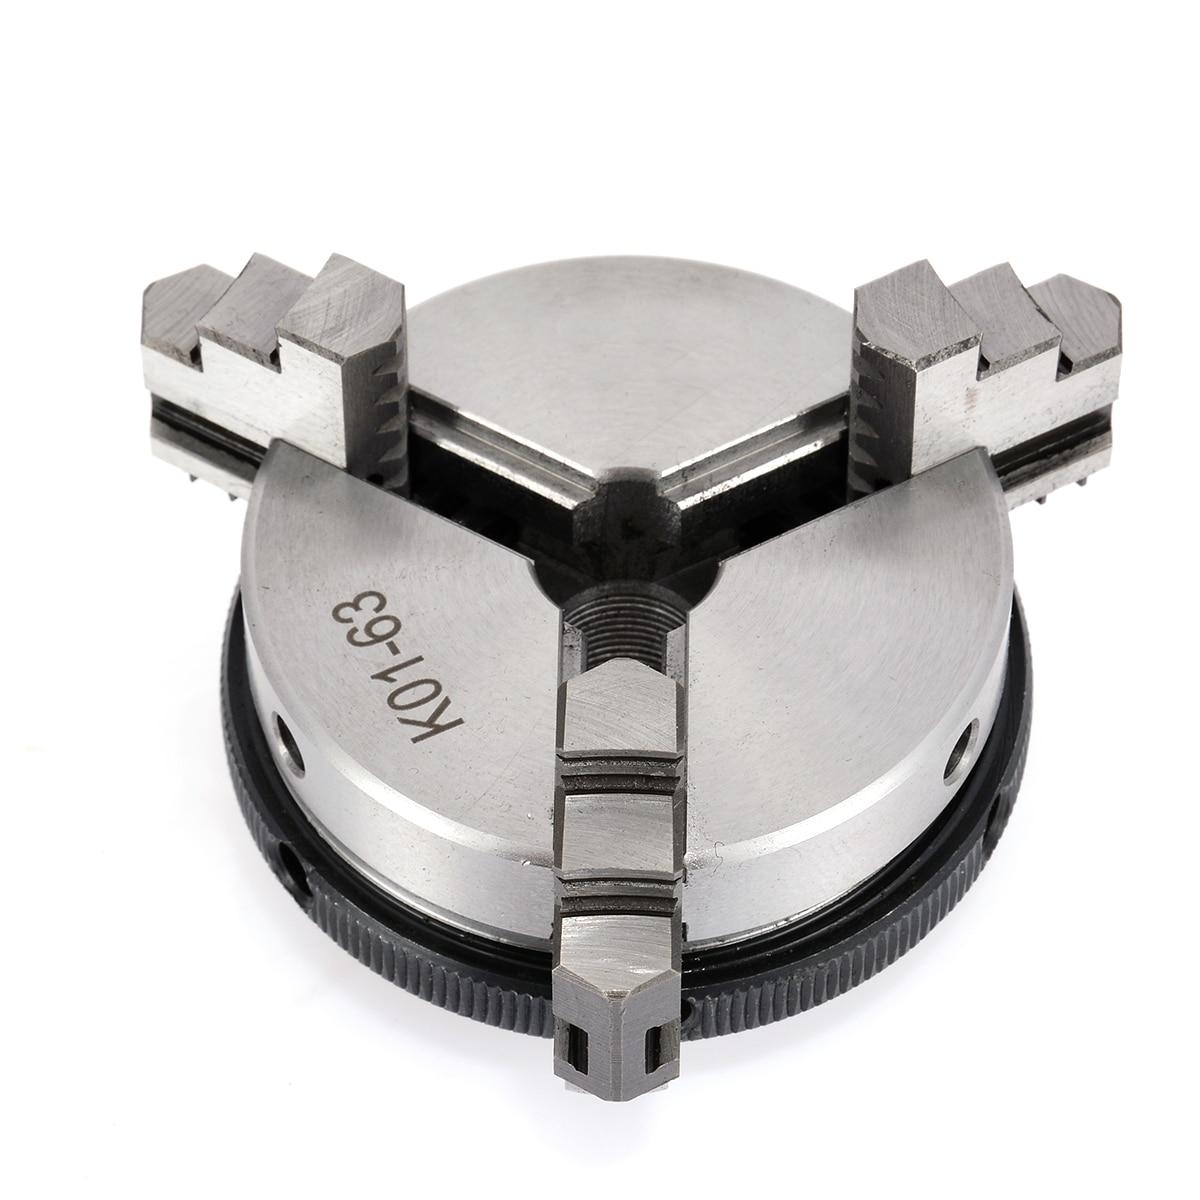 1Pcs 63mm 3 Jaw Chuck 2.5 inch Mini Metal Lathe Chucks with 2pcs Lock Rods For Metalworking Machine Accessories Tool